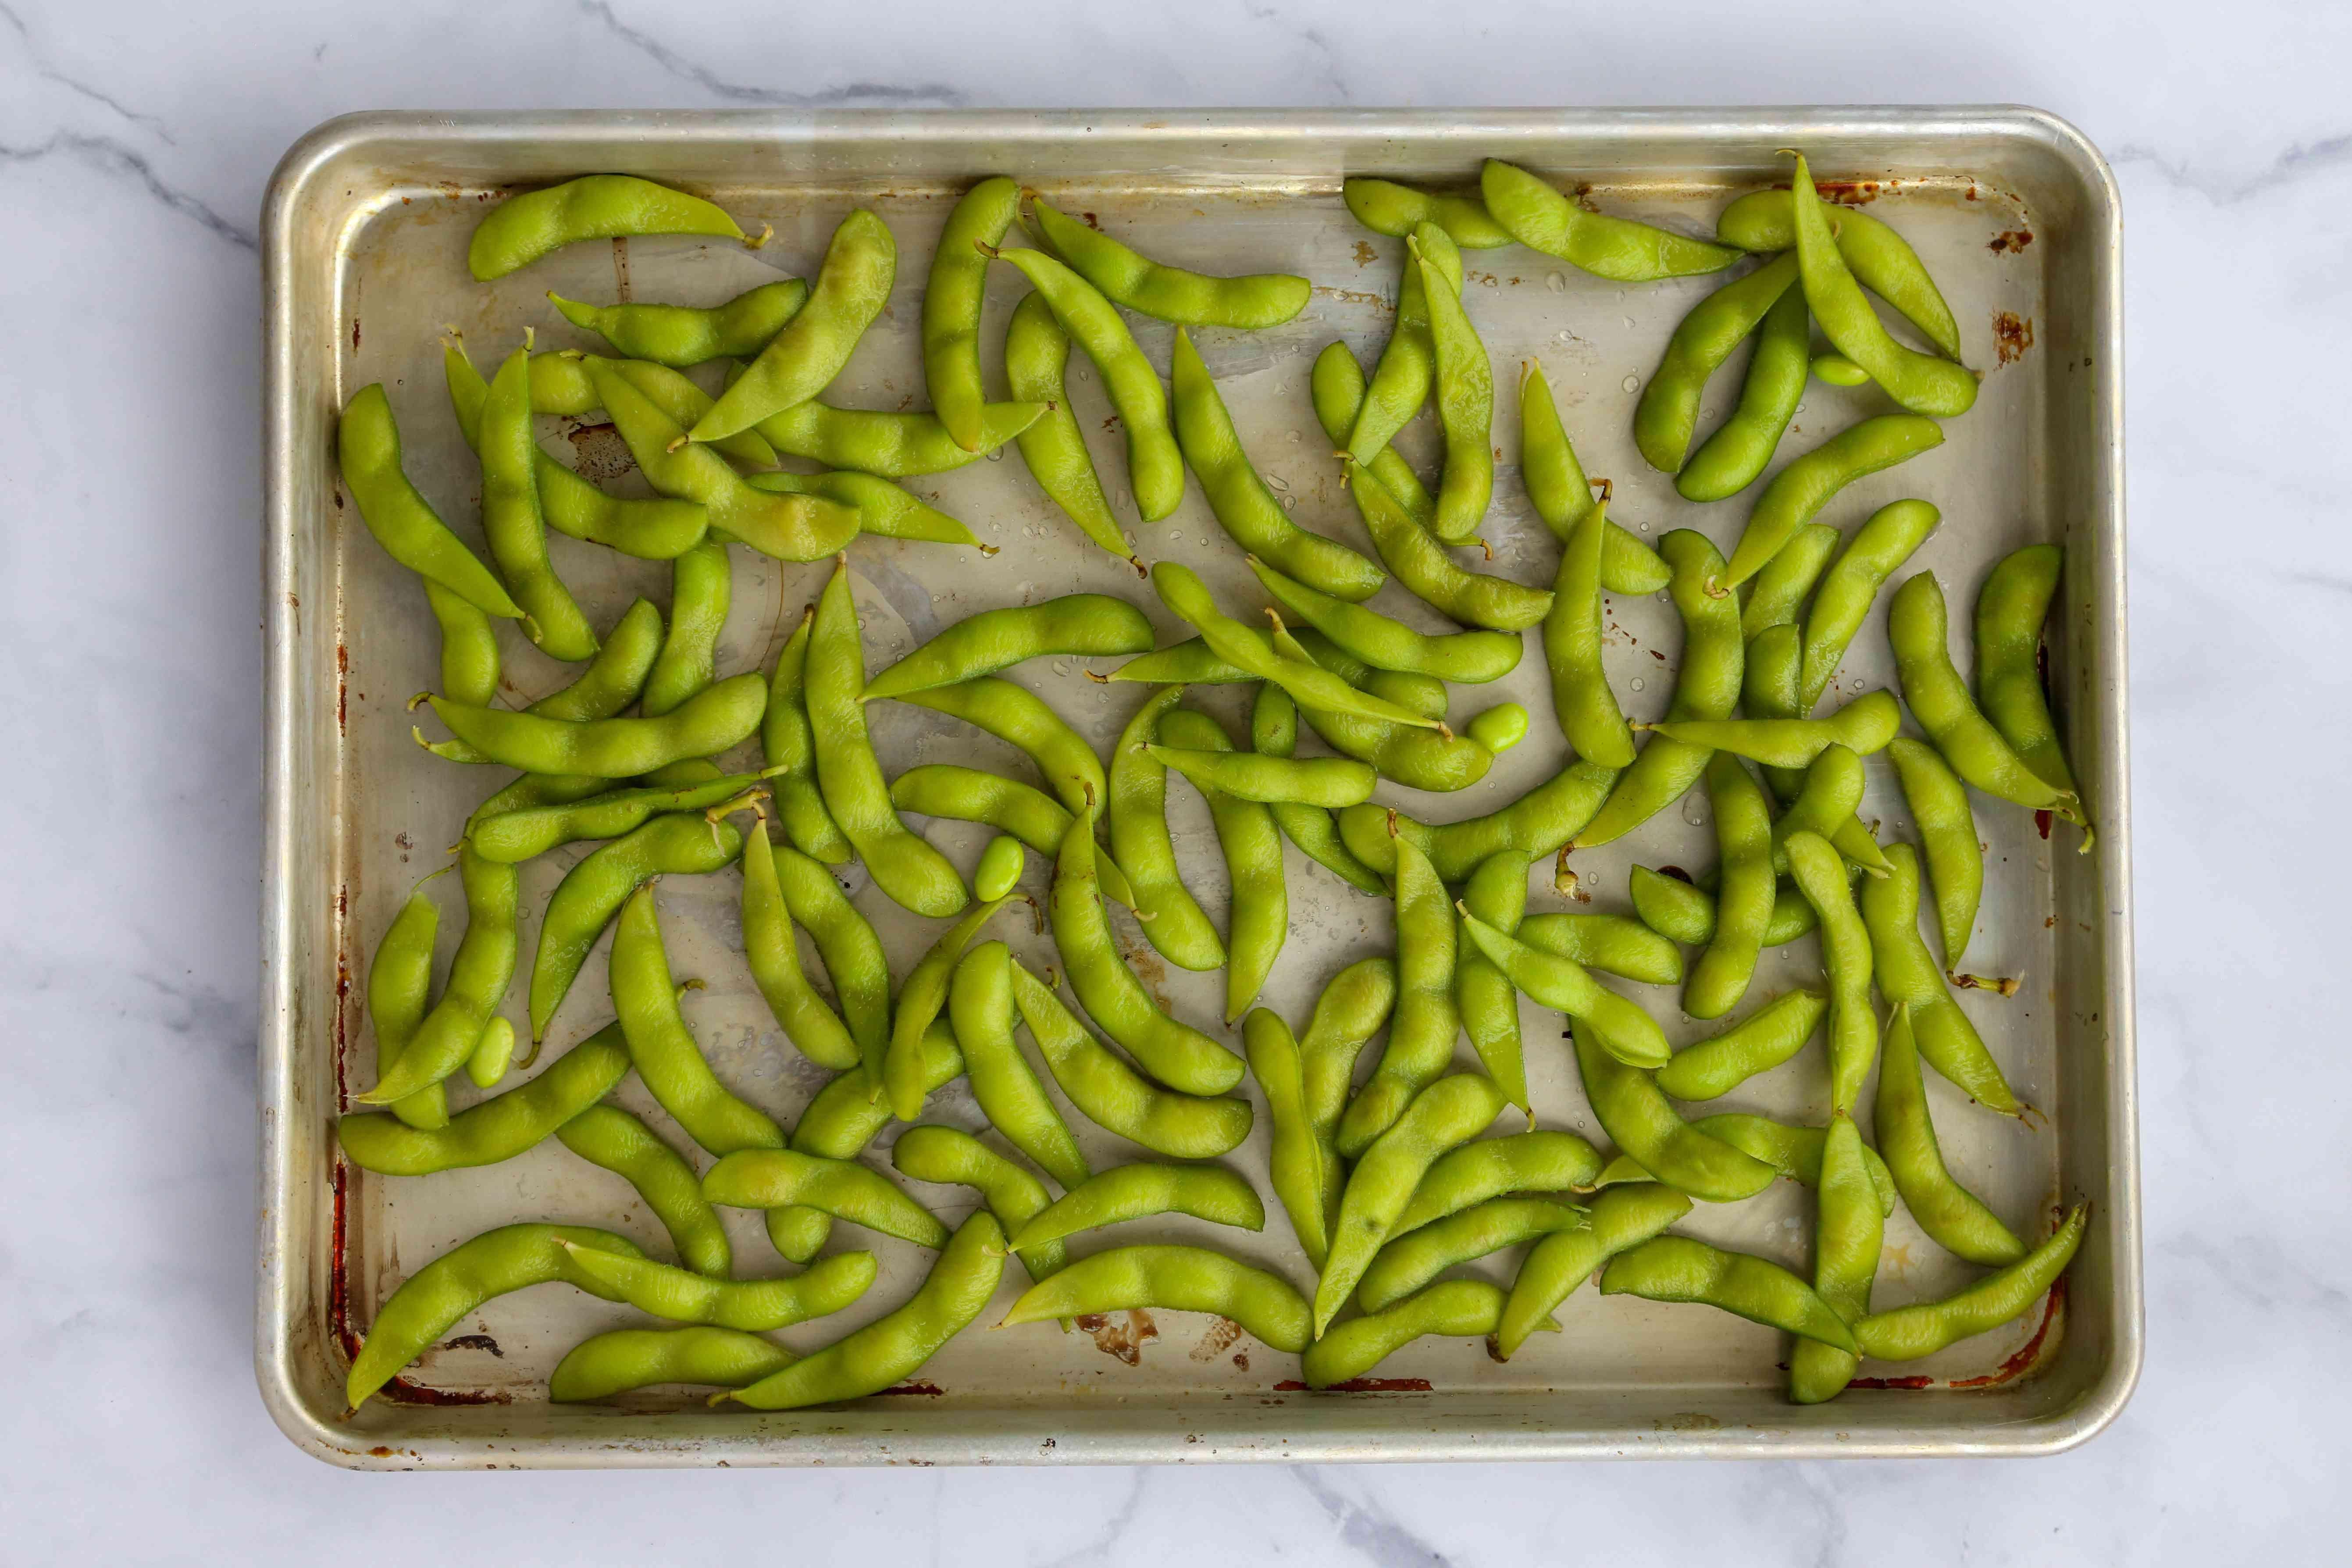 Boiled Edamame on a baking sheet